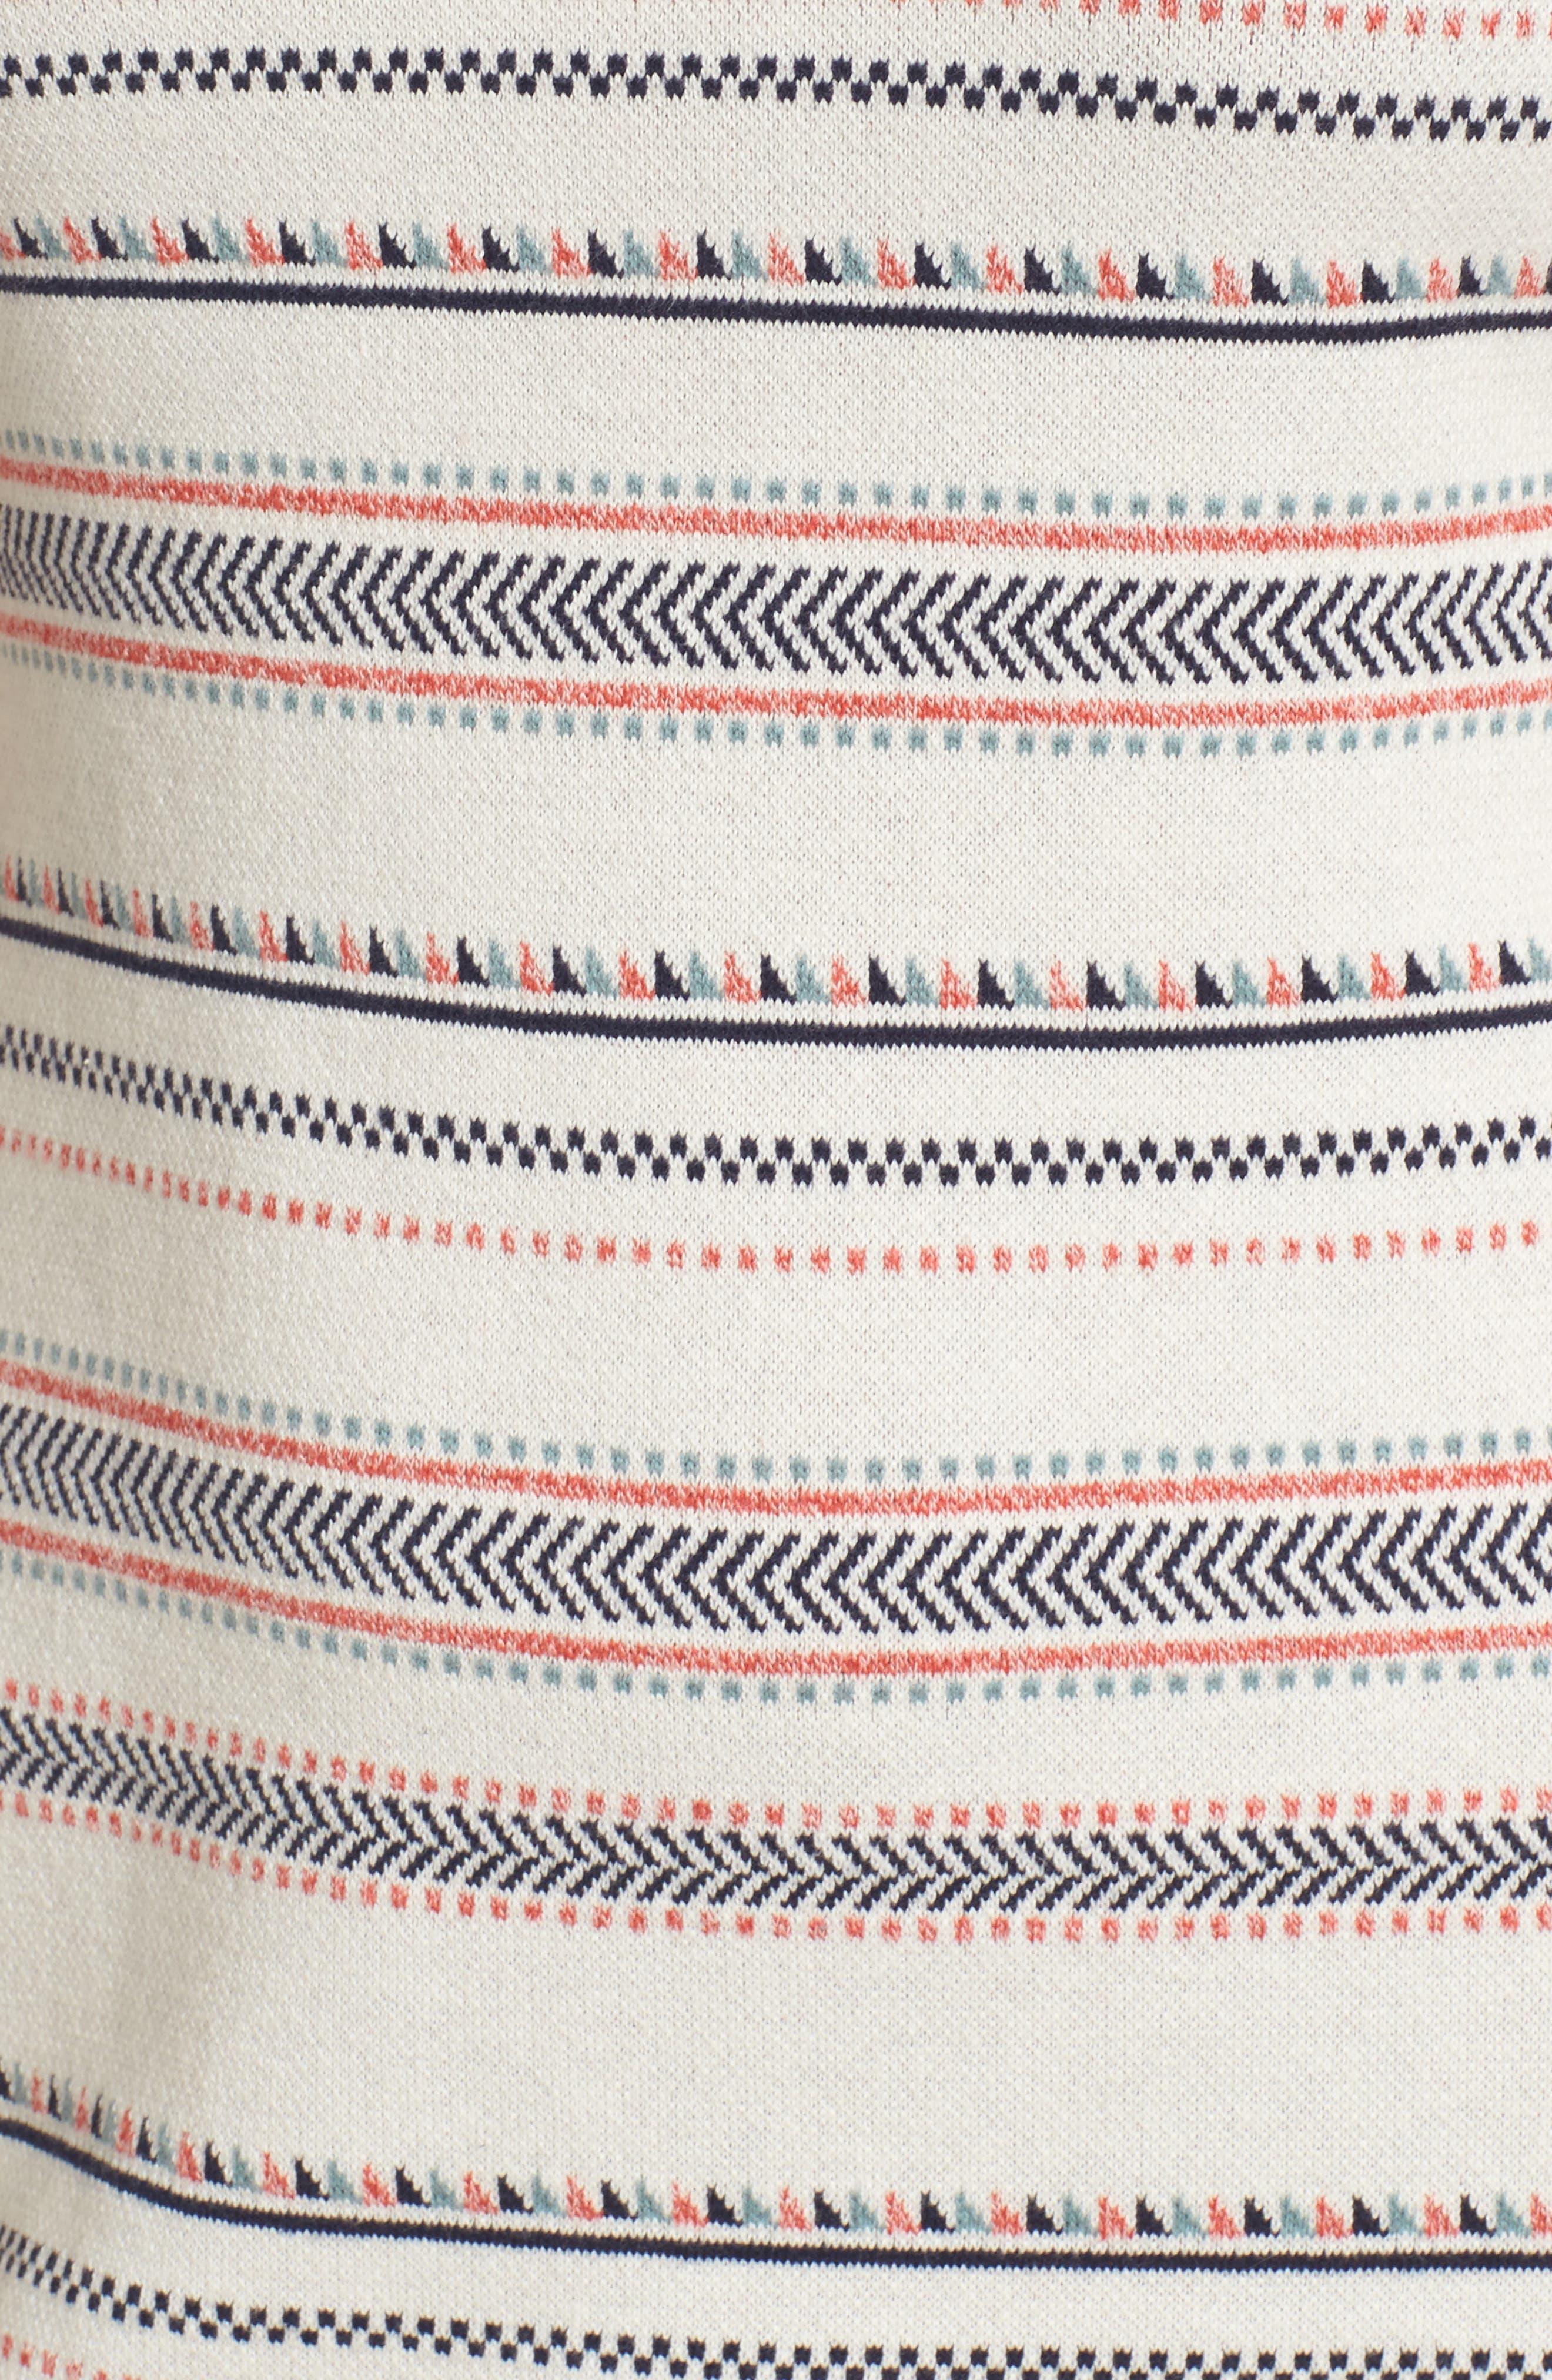 Sonata Sheath Dress,                             Alternate thumbnail 5, color,                             902